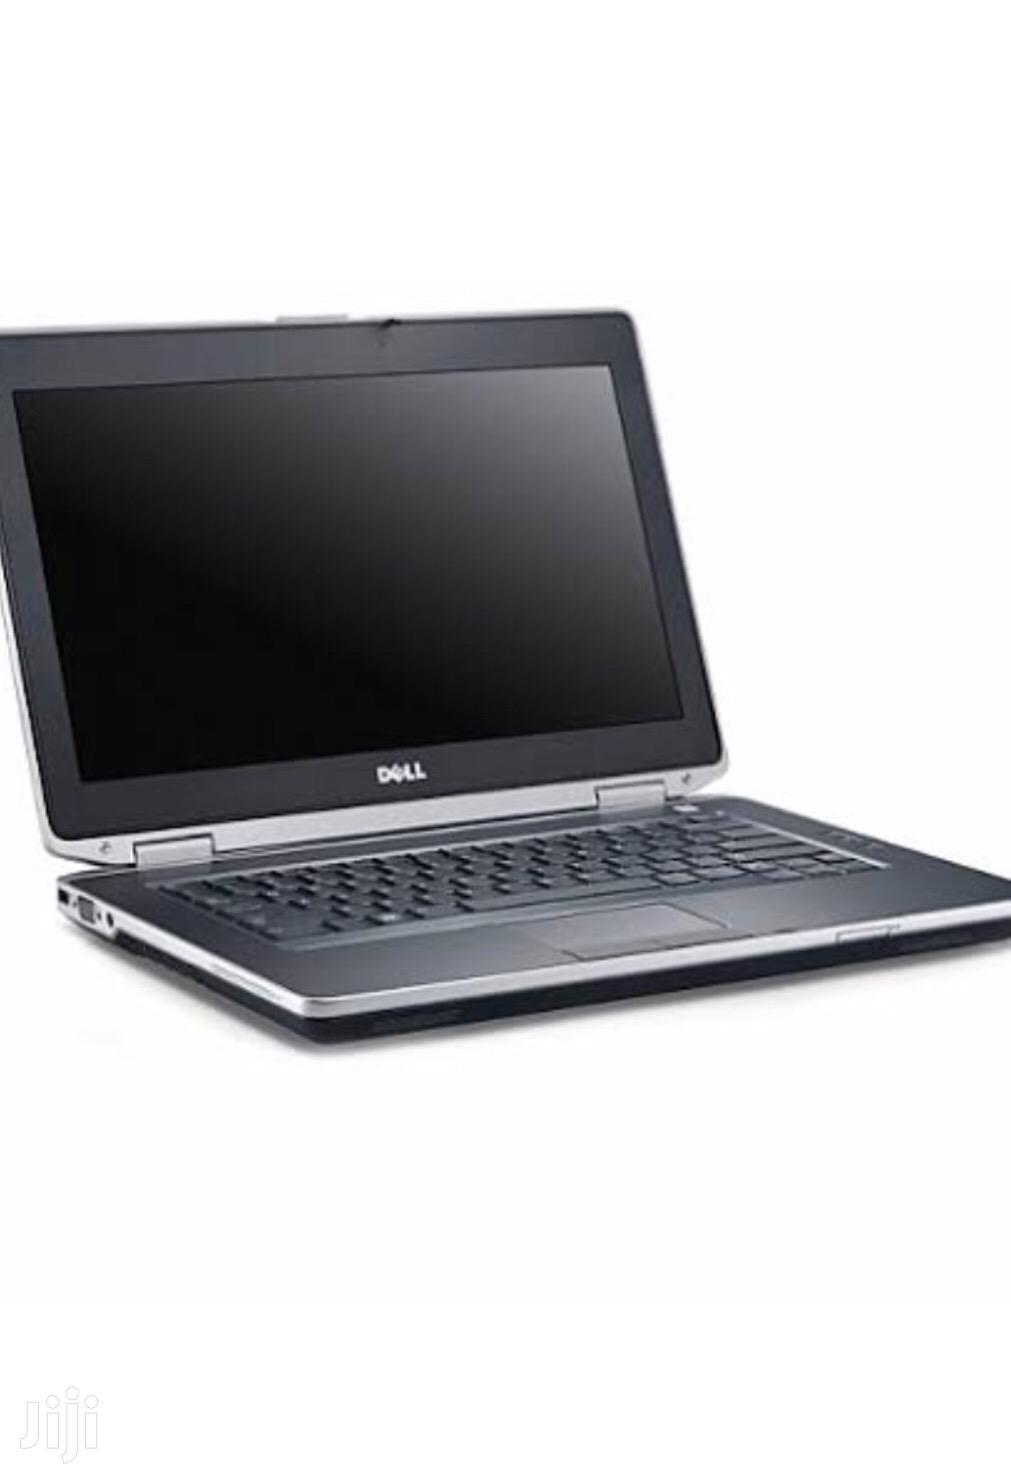 Laptop Dell Latitude E6530 4GB Intel Core I3 HDD 320GB | Laptops & Computers for sale in Kahawa, Nairobi, Kenya